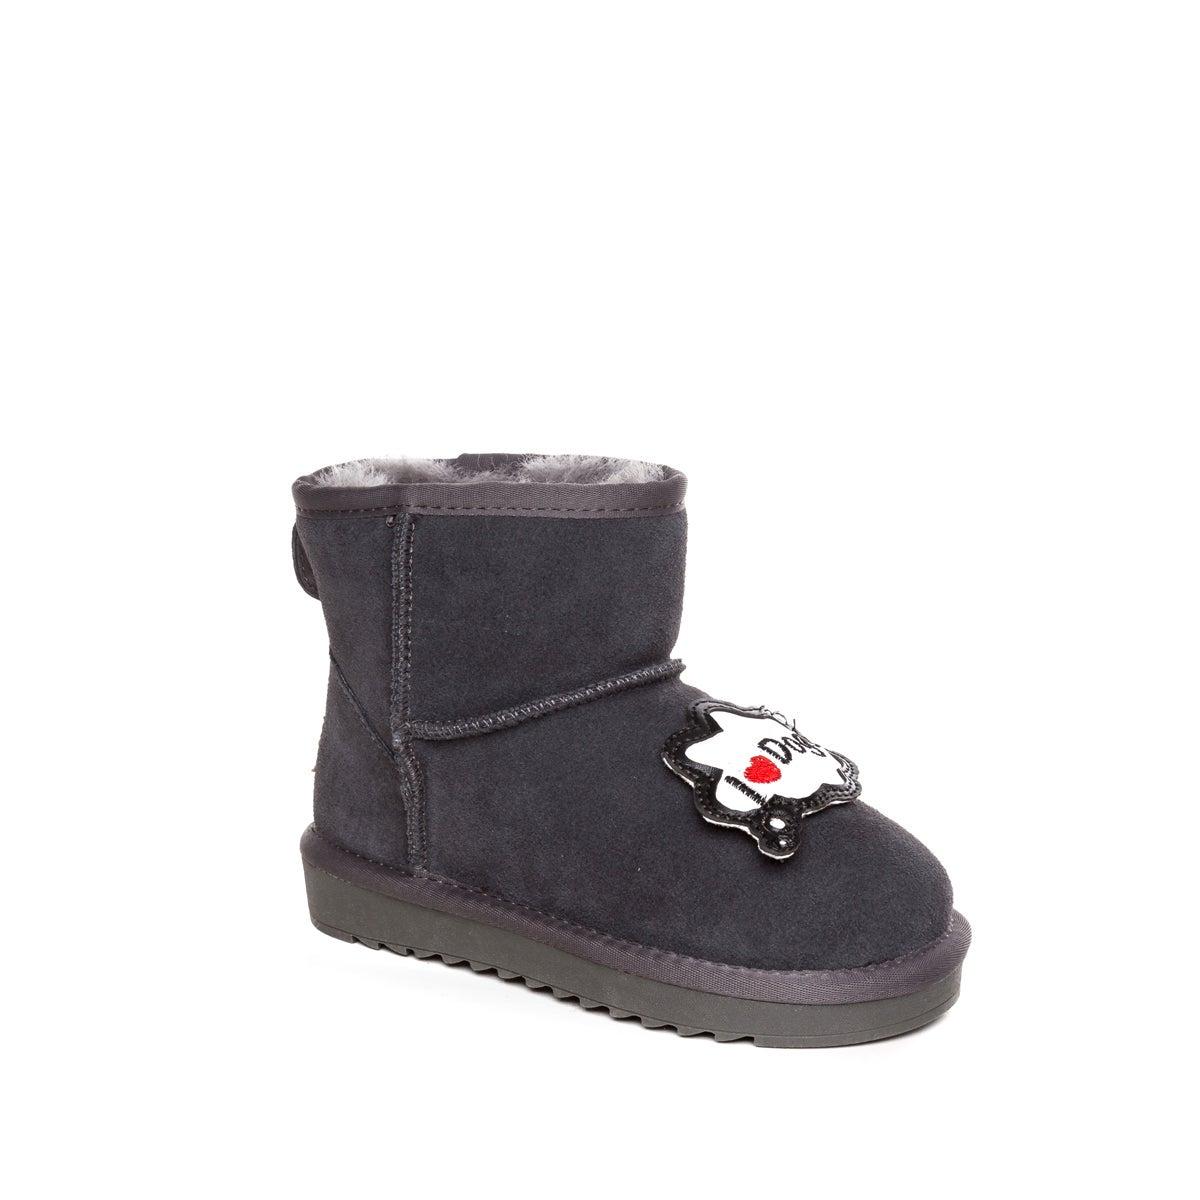 OZWEAR UGG KIDS I LOVE DOG MINI BOOTS